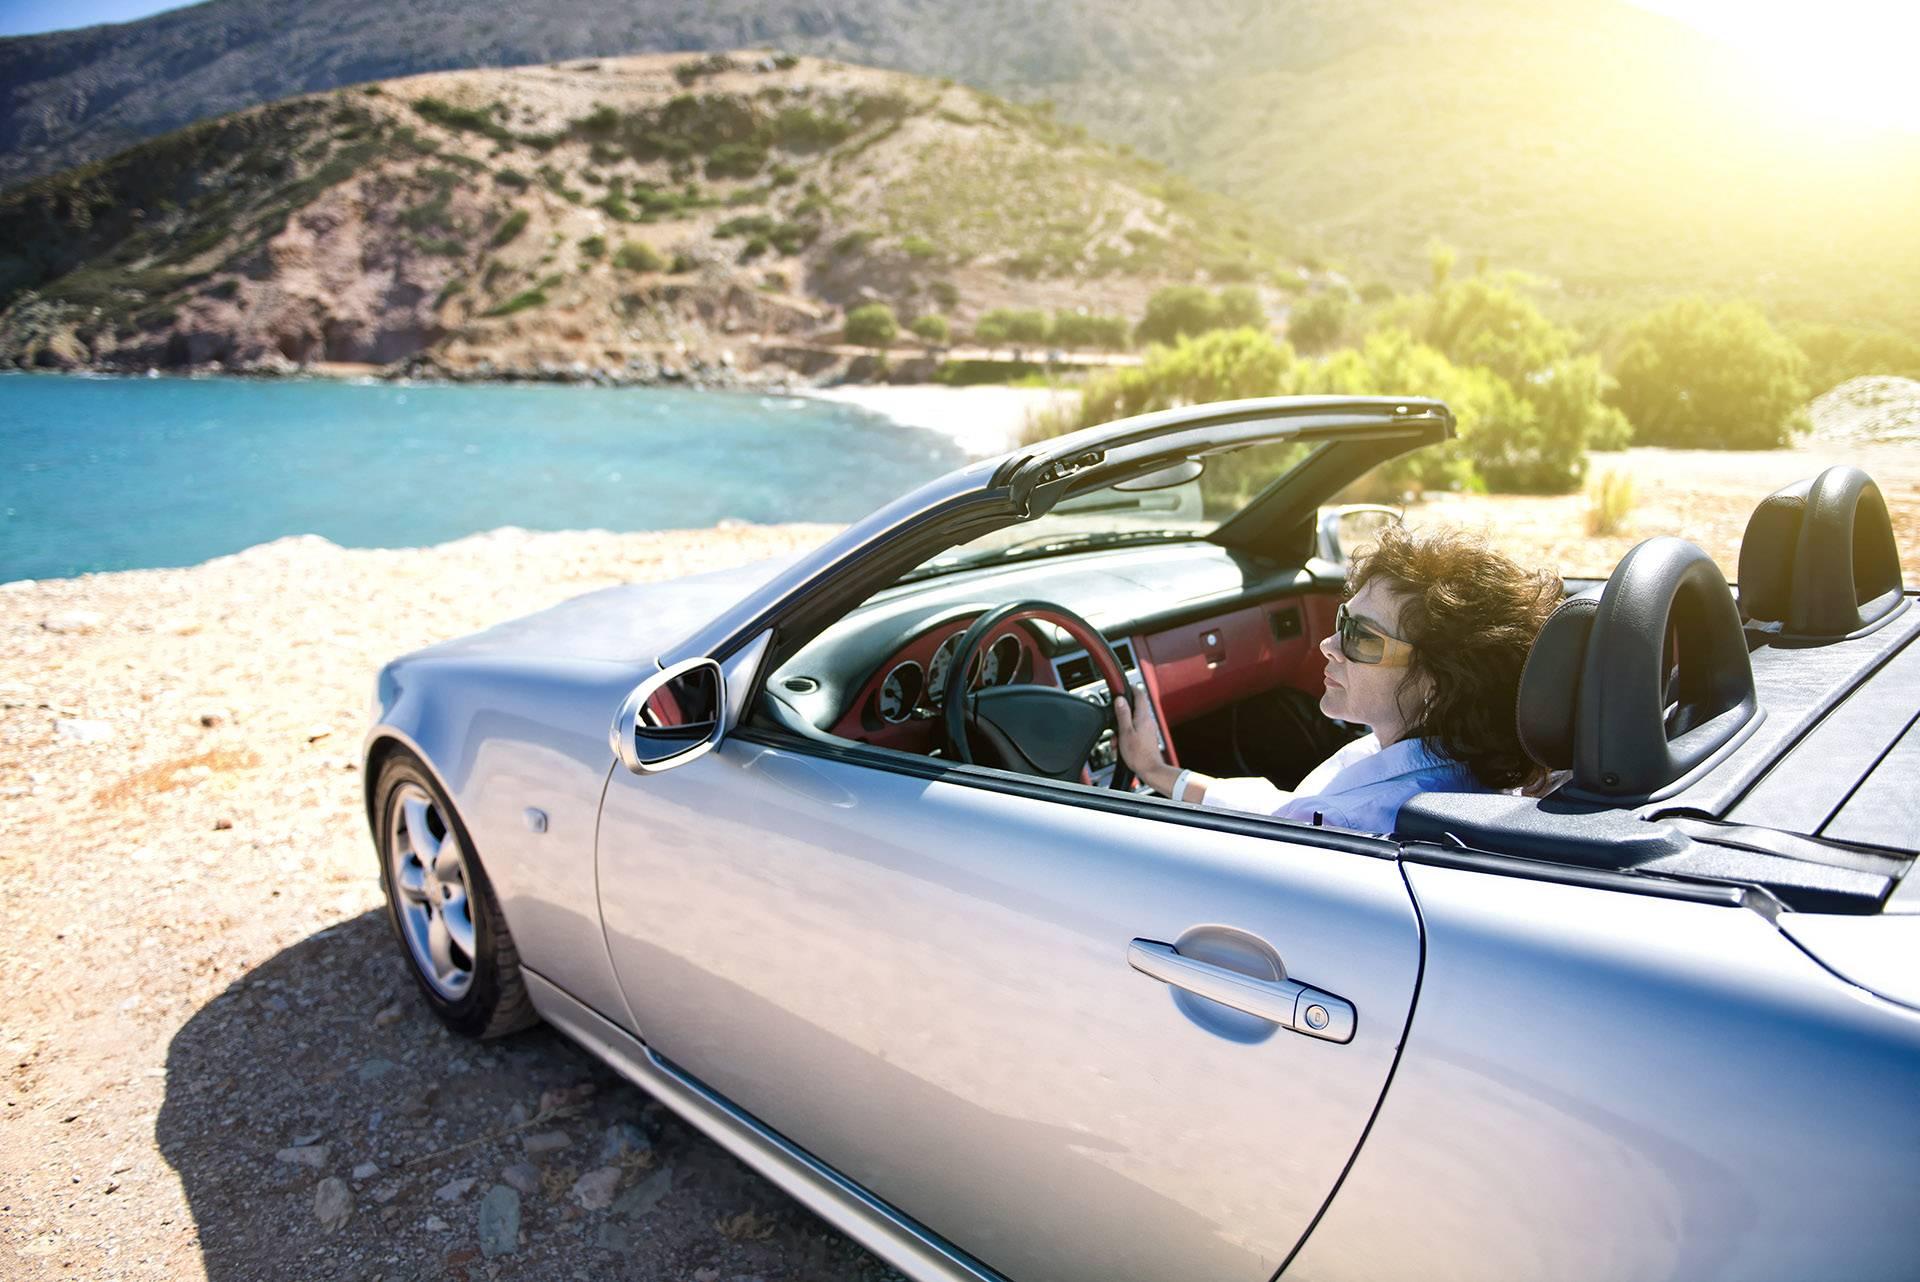 Прокат авто sixt, валенсия. тонкости аренды авто для граждан рф в валенсии прокат авто валенсия